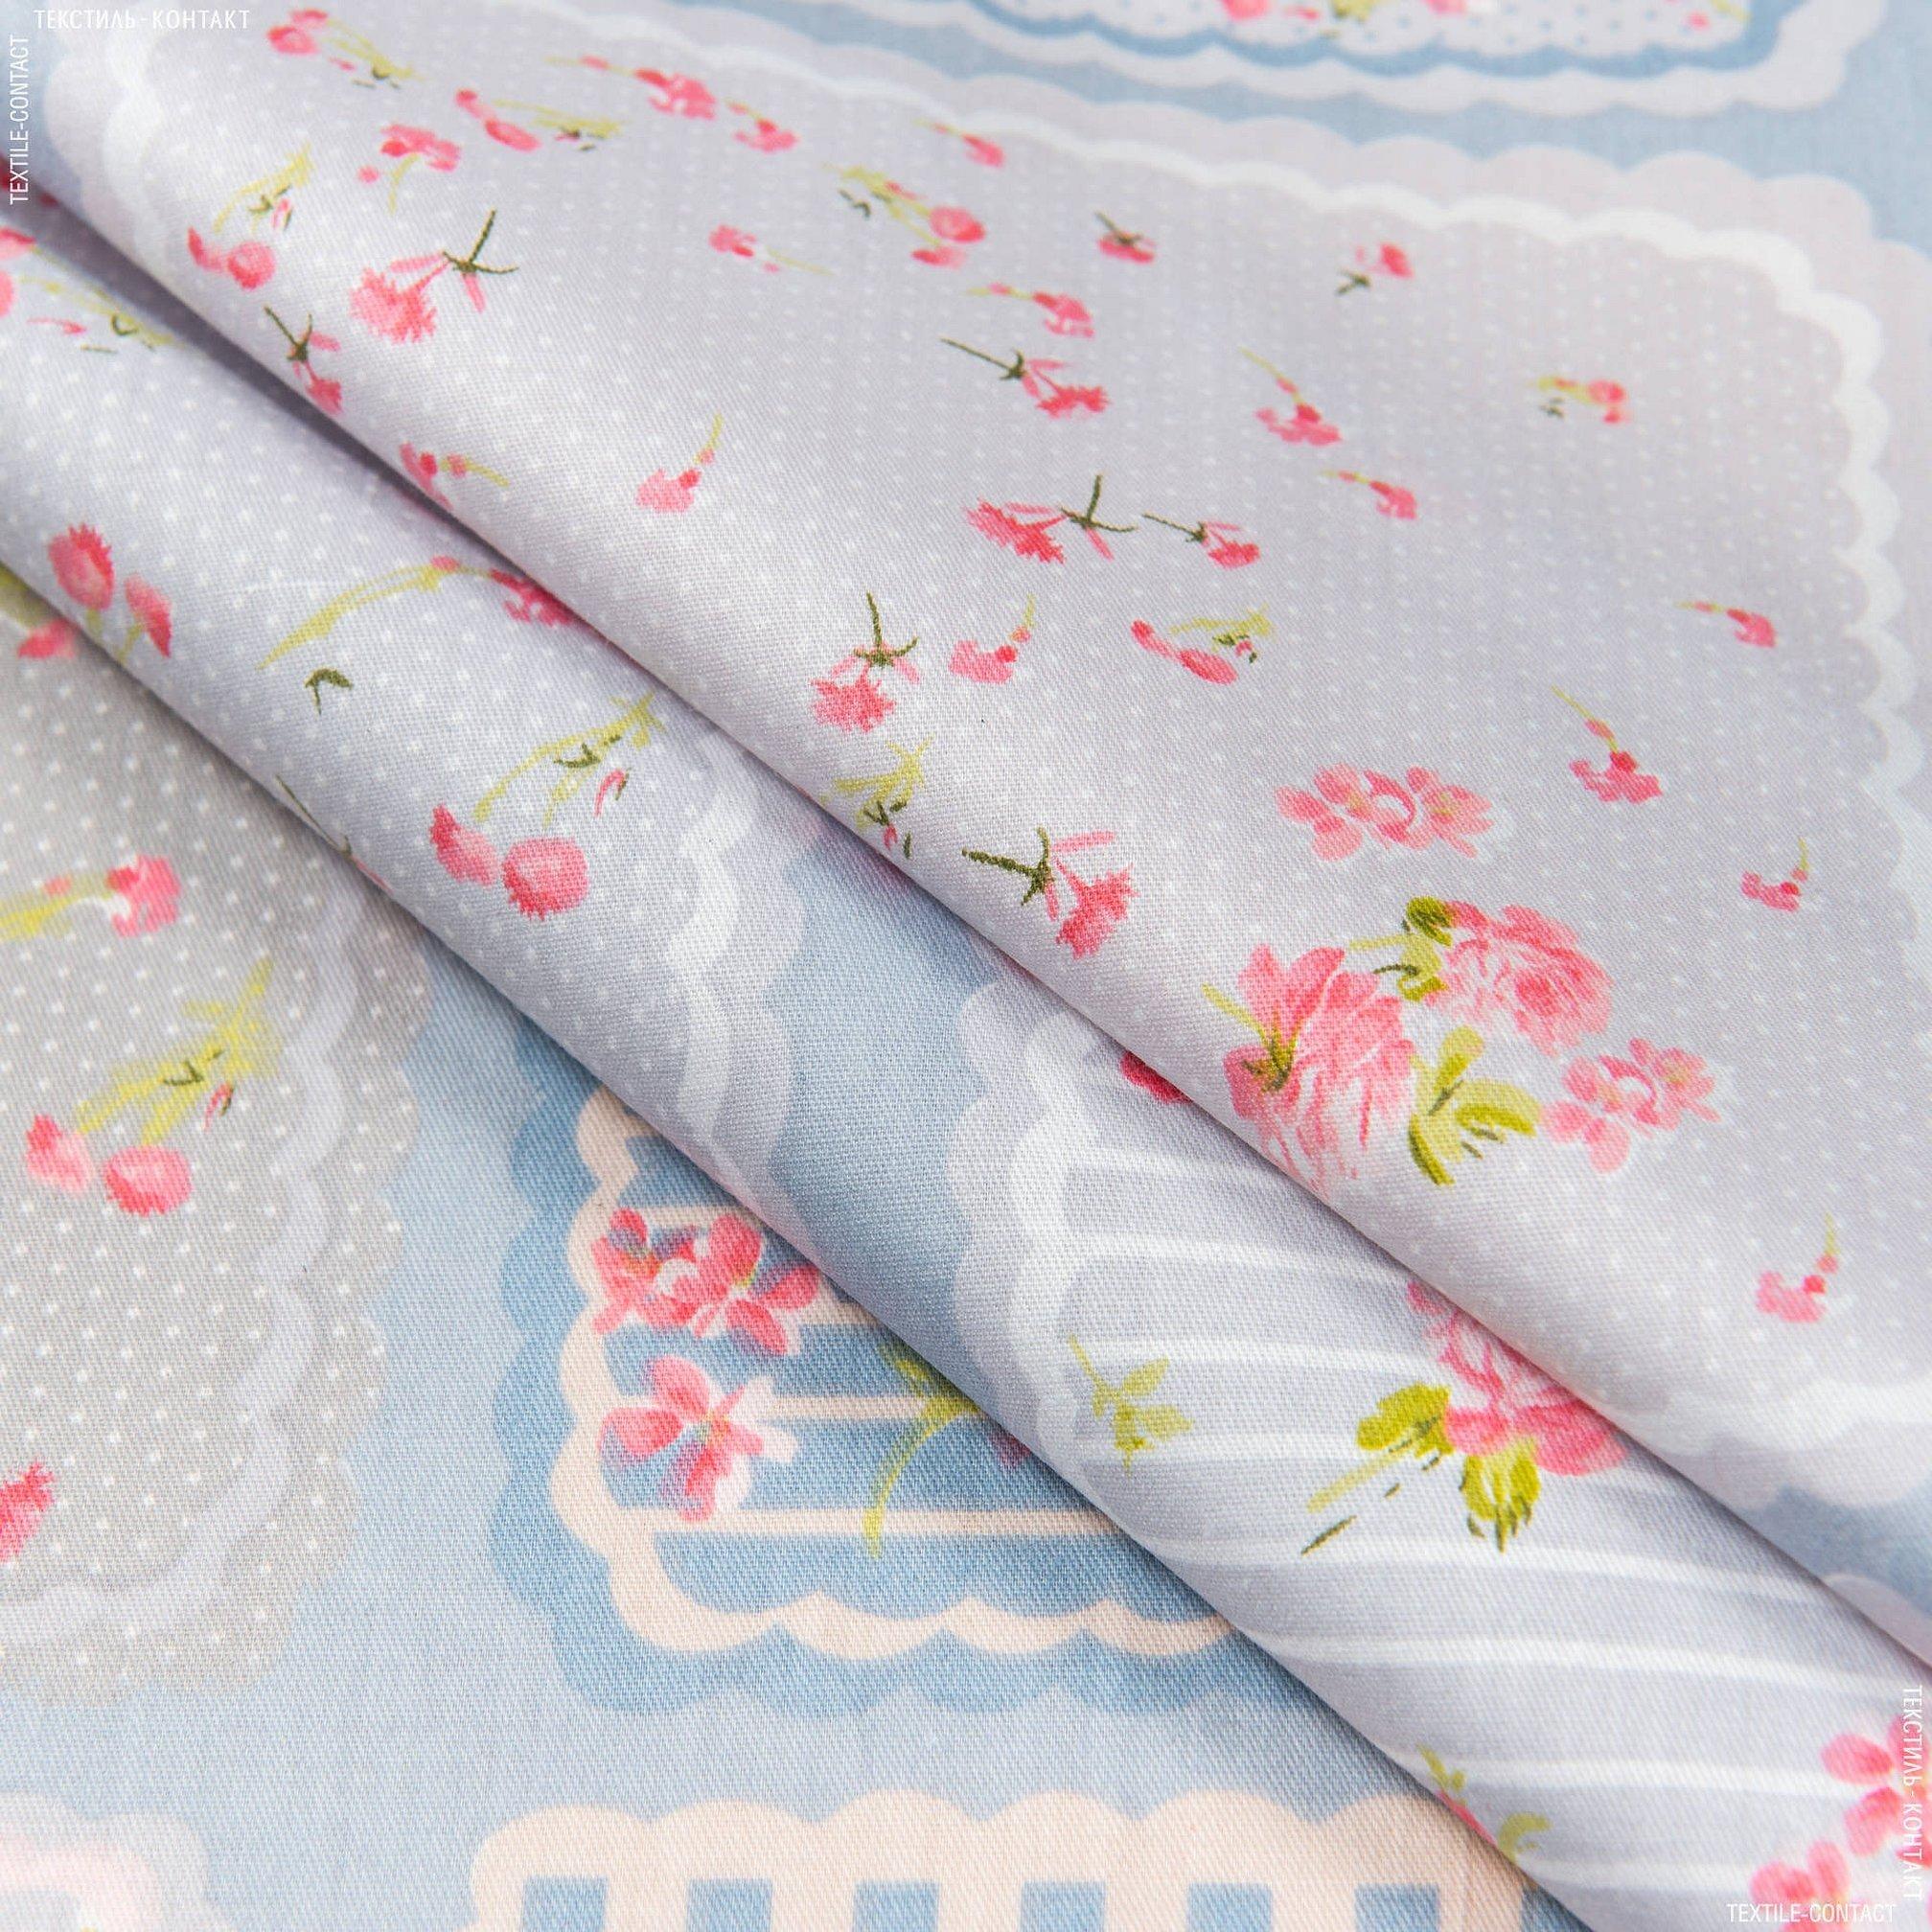 Текстиль текстиль ткань ситец хлопок